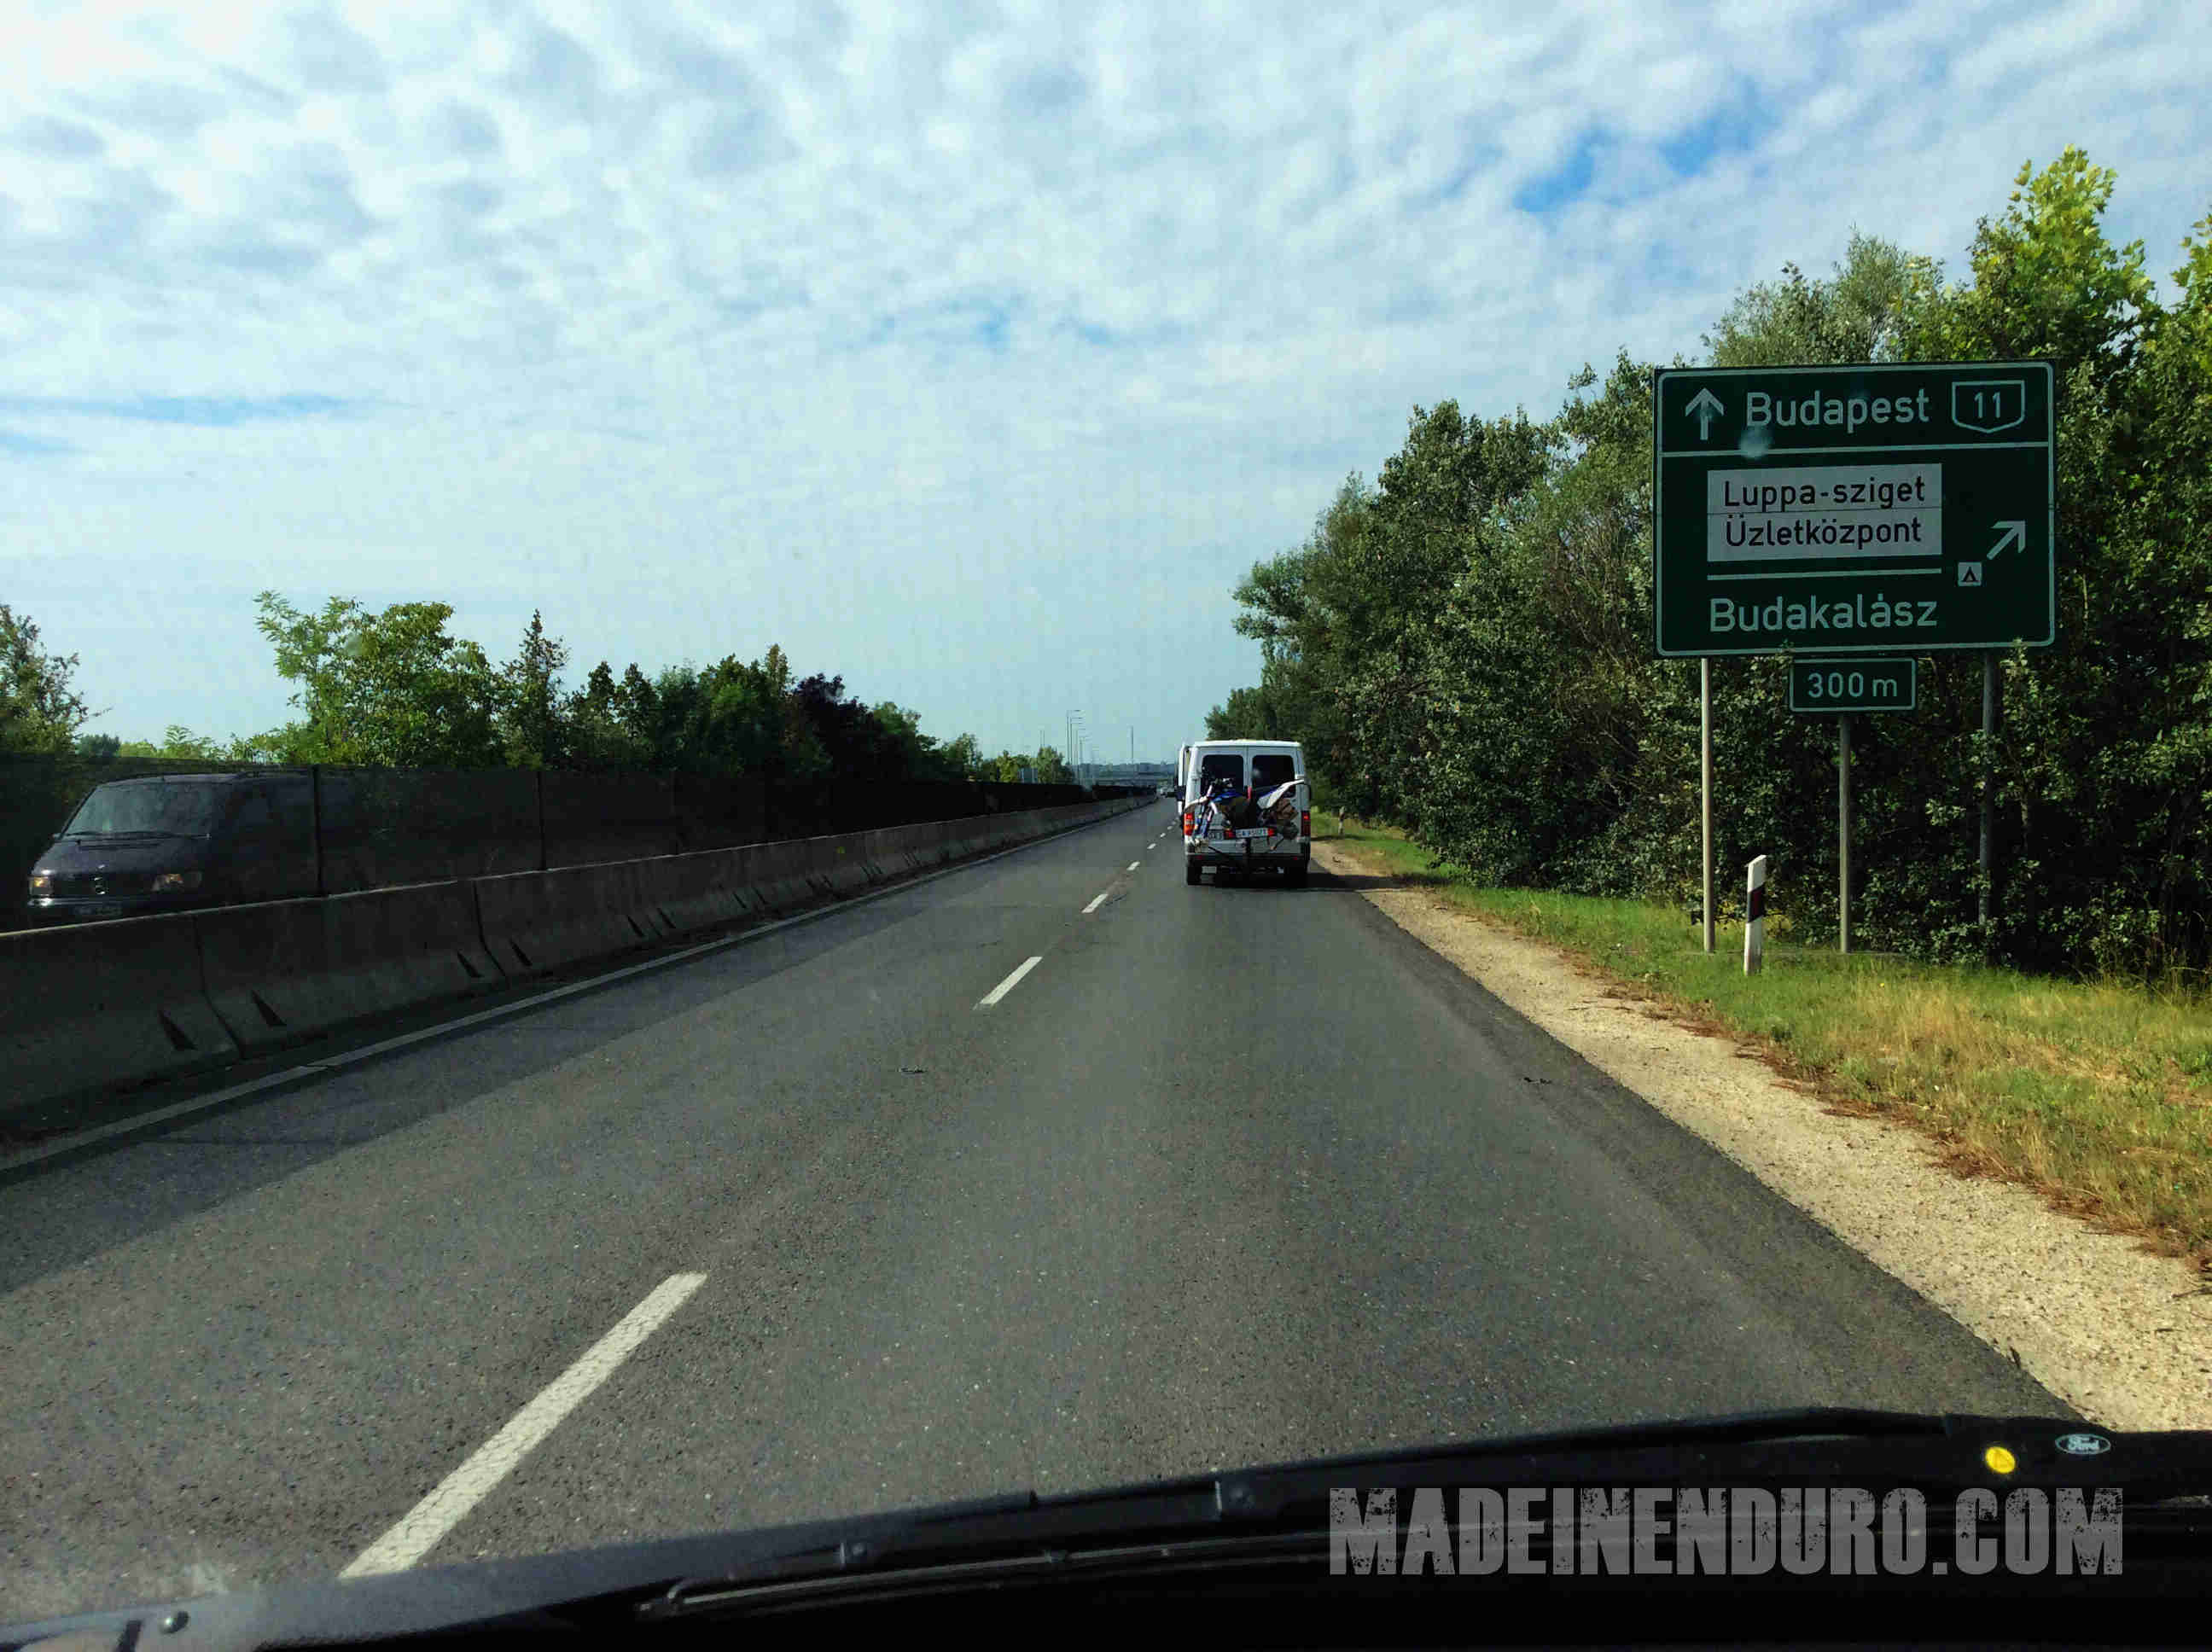 Zxx hit the road - Budapeszt